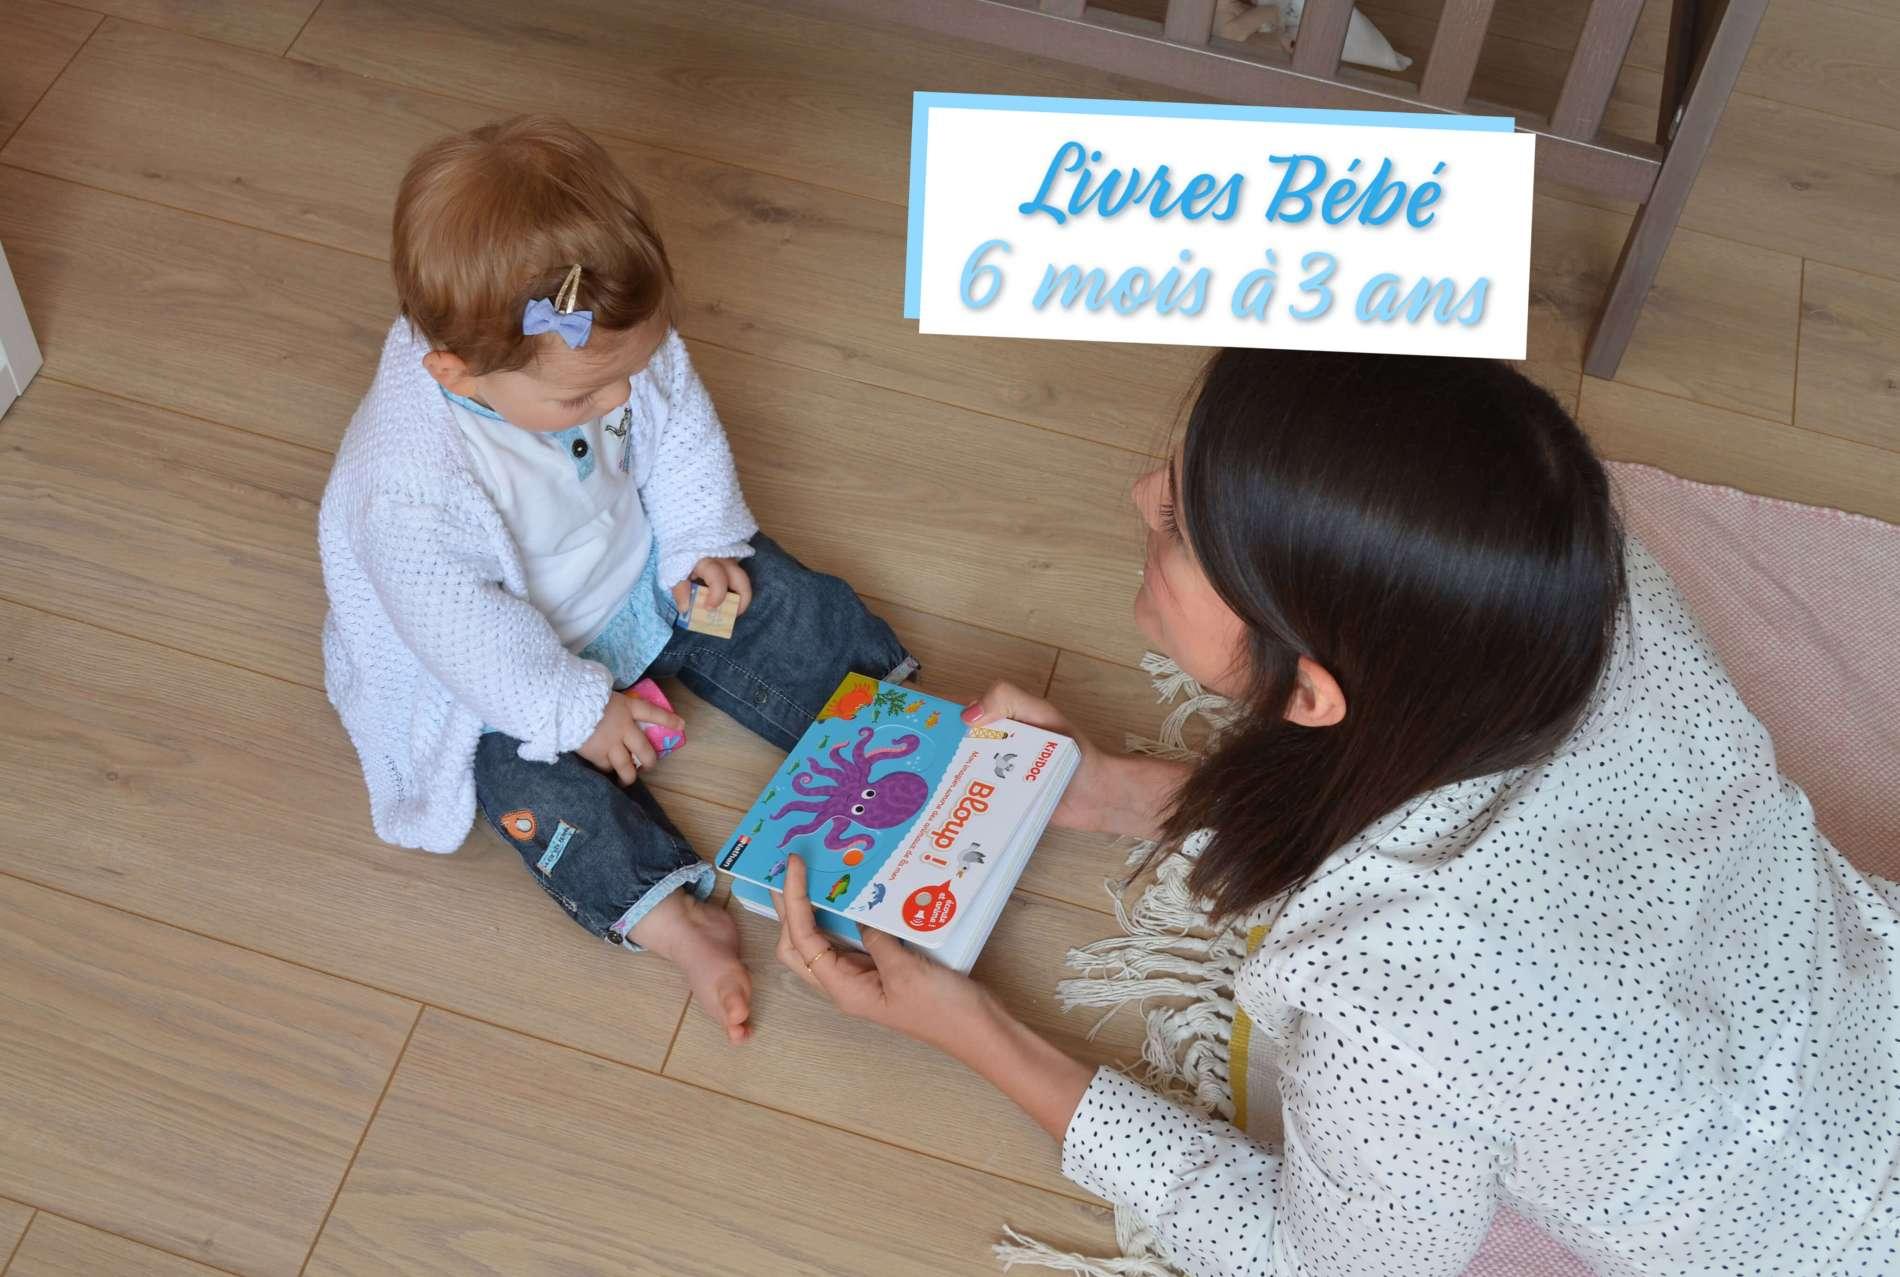 livres bébé